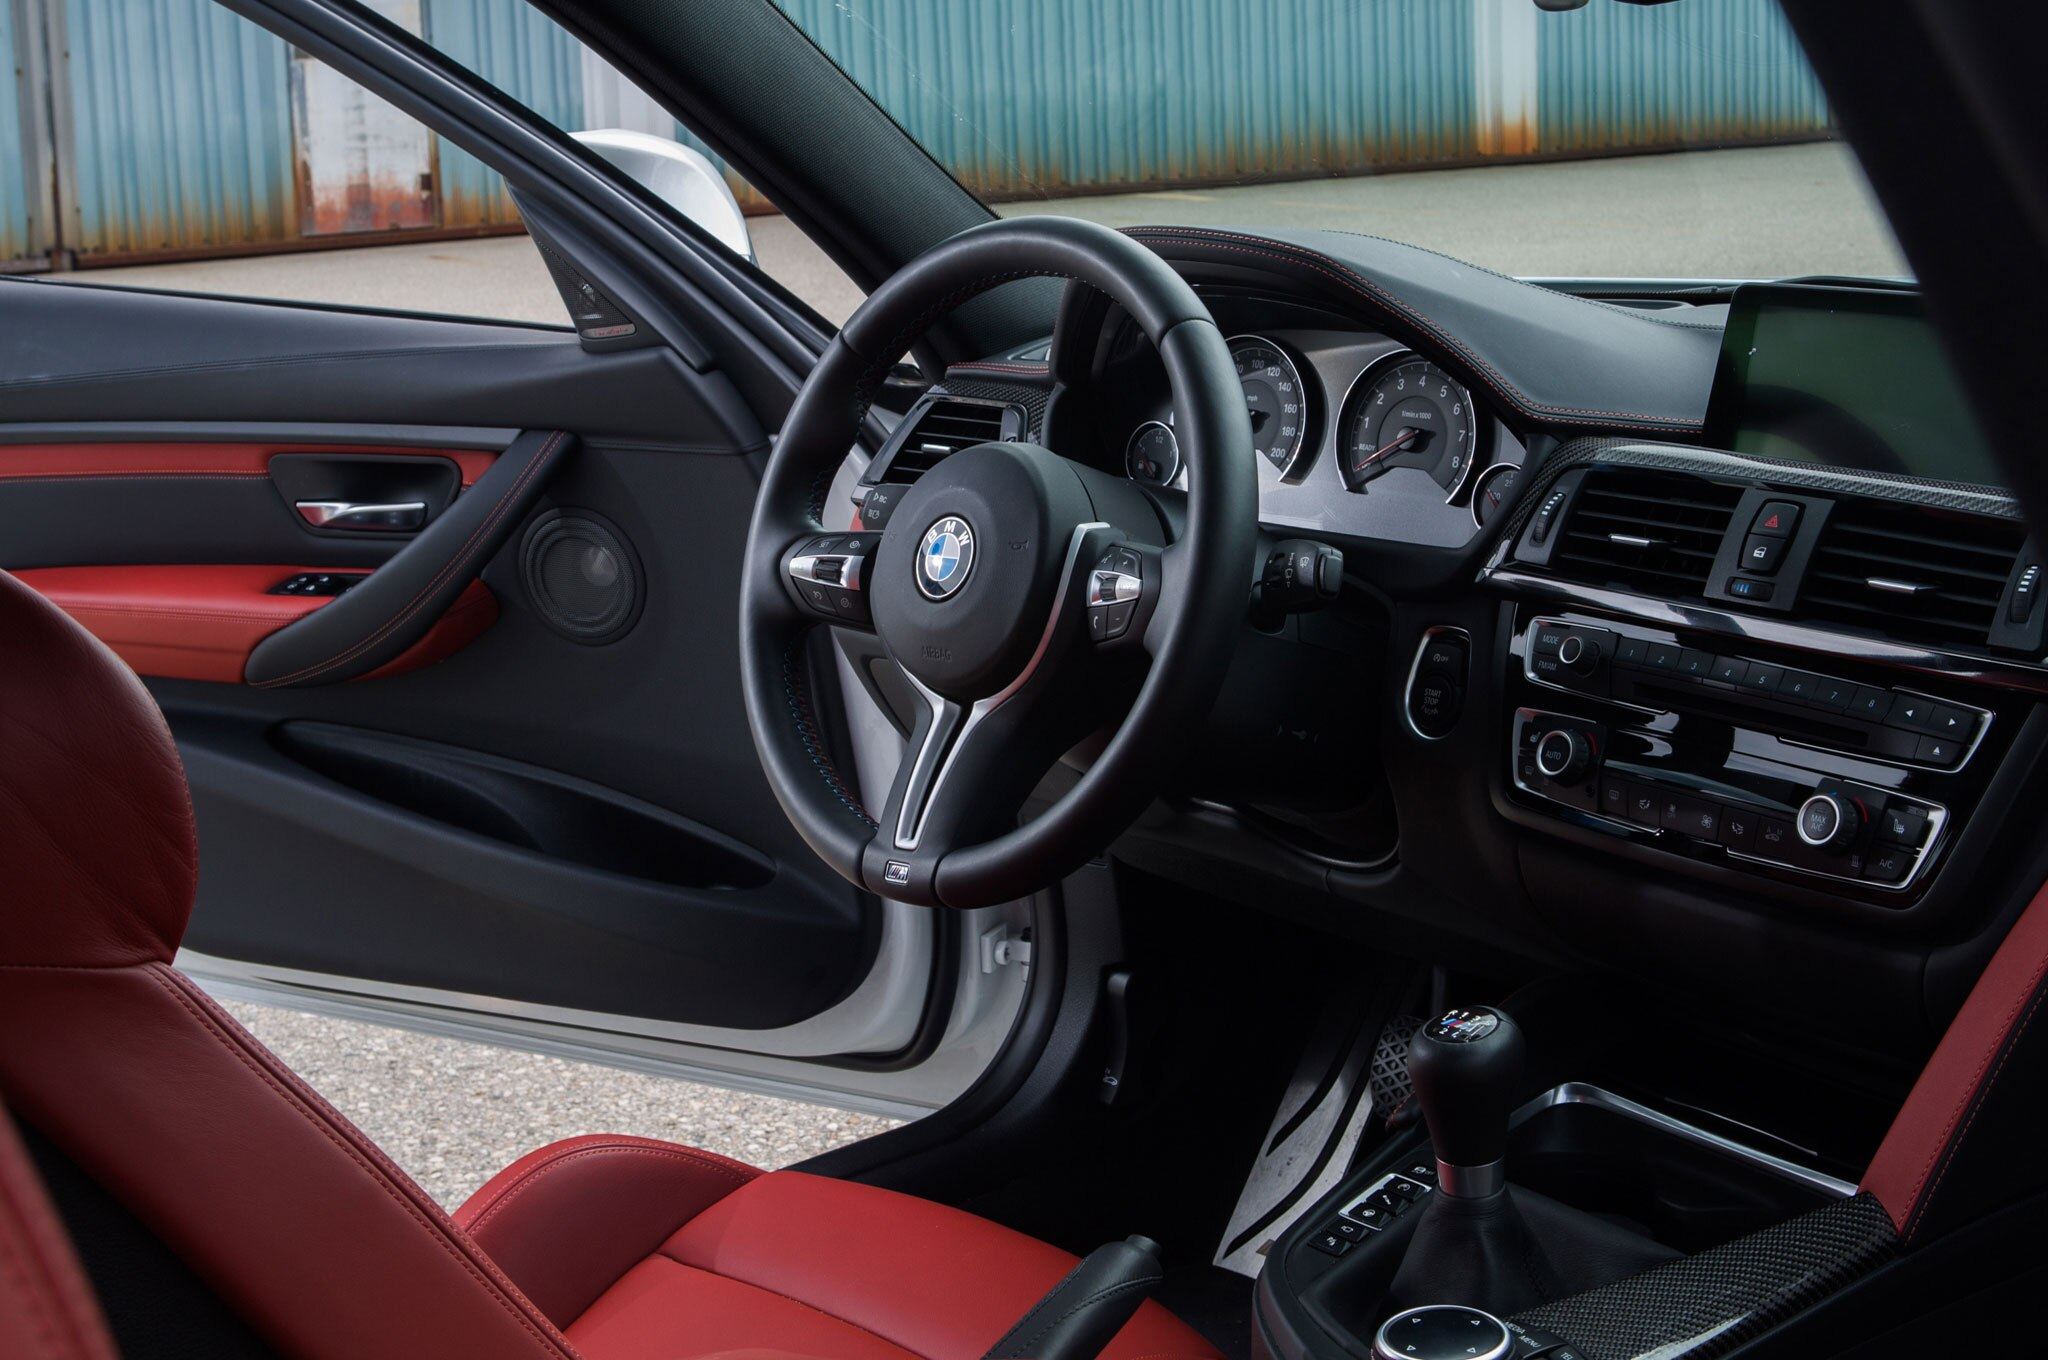 2014 bmw m3 interior. 2015 bmw m3 interior 2014 bmw